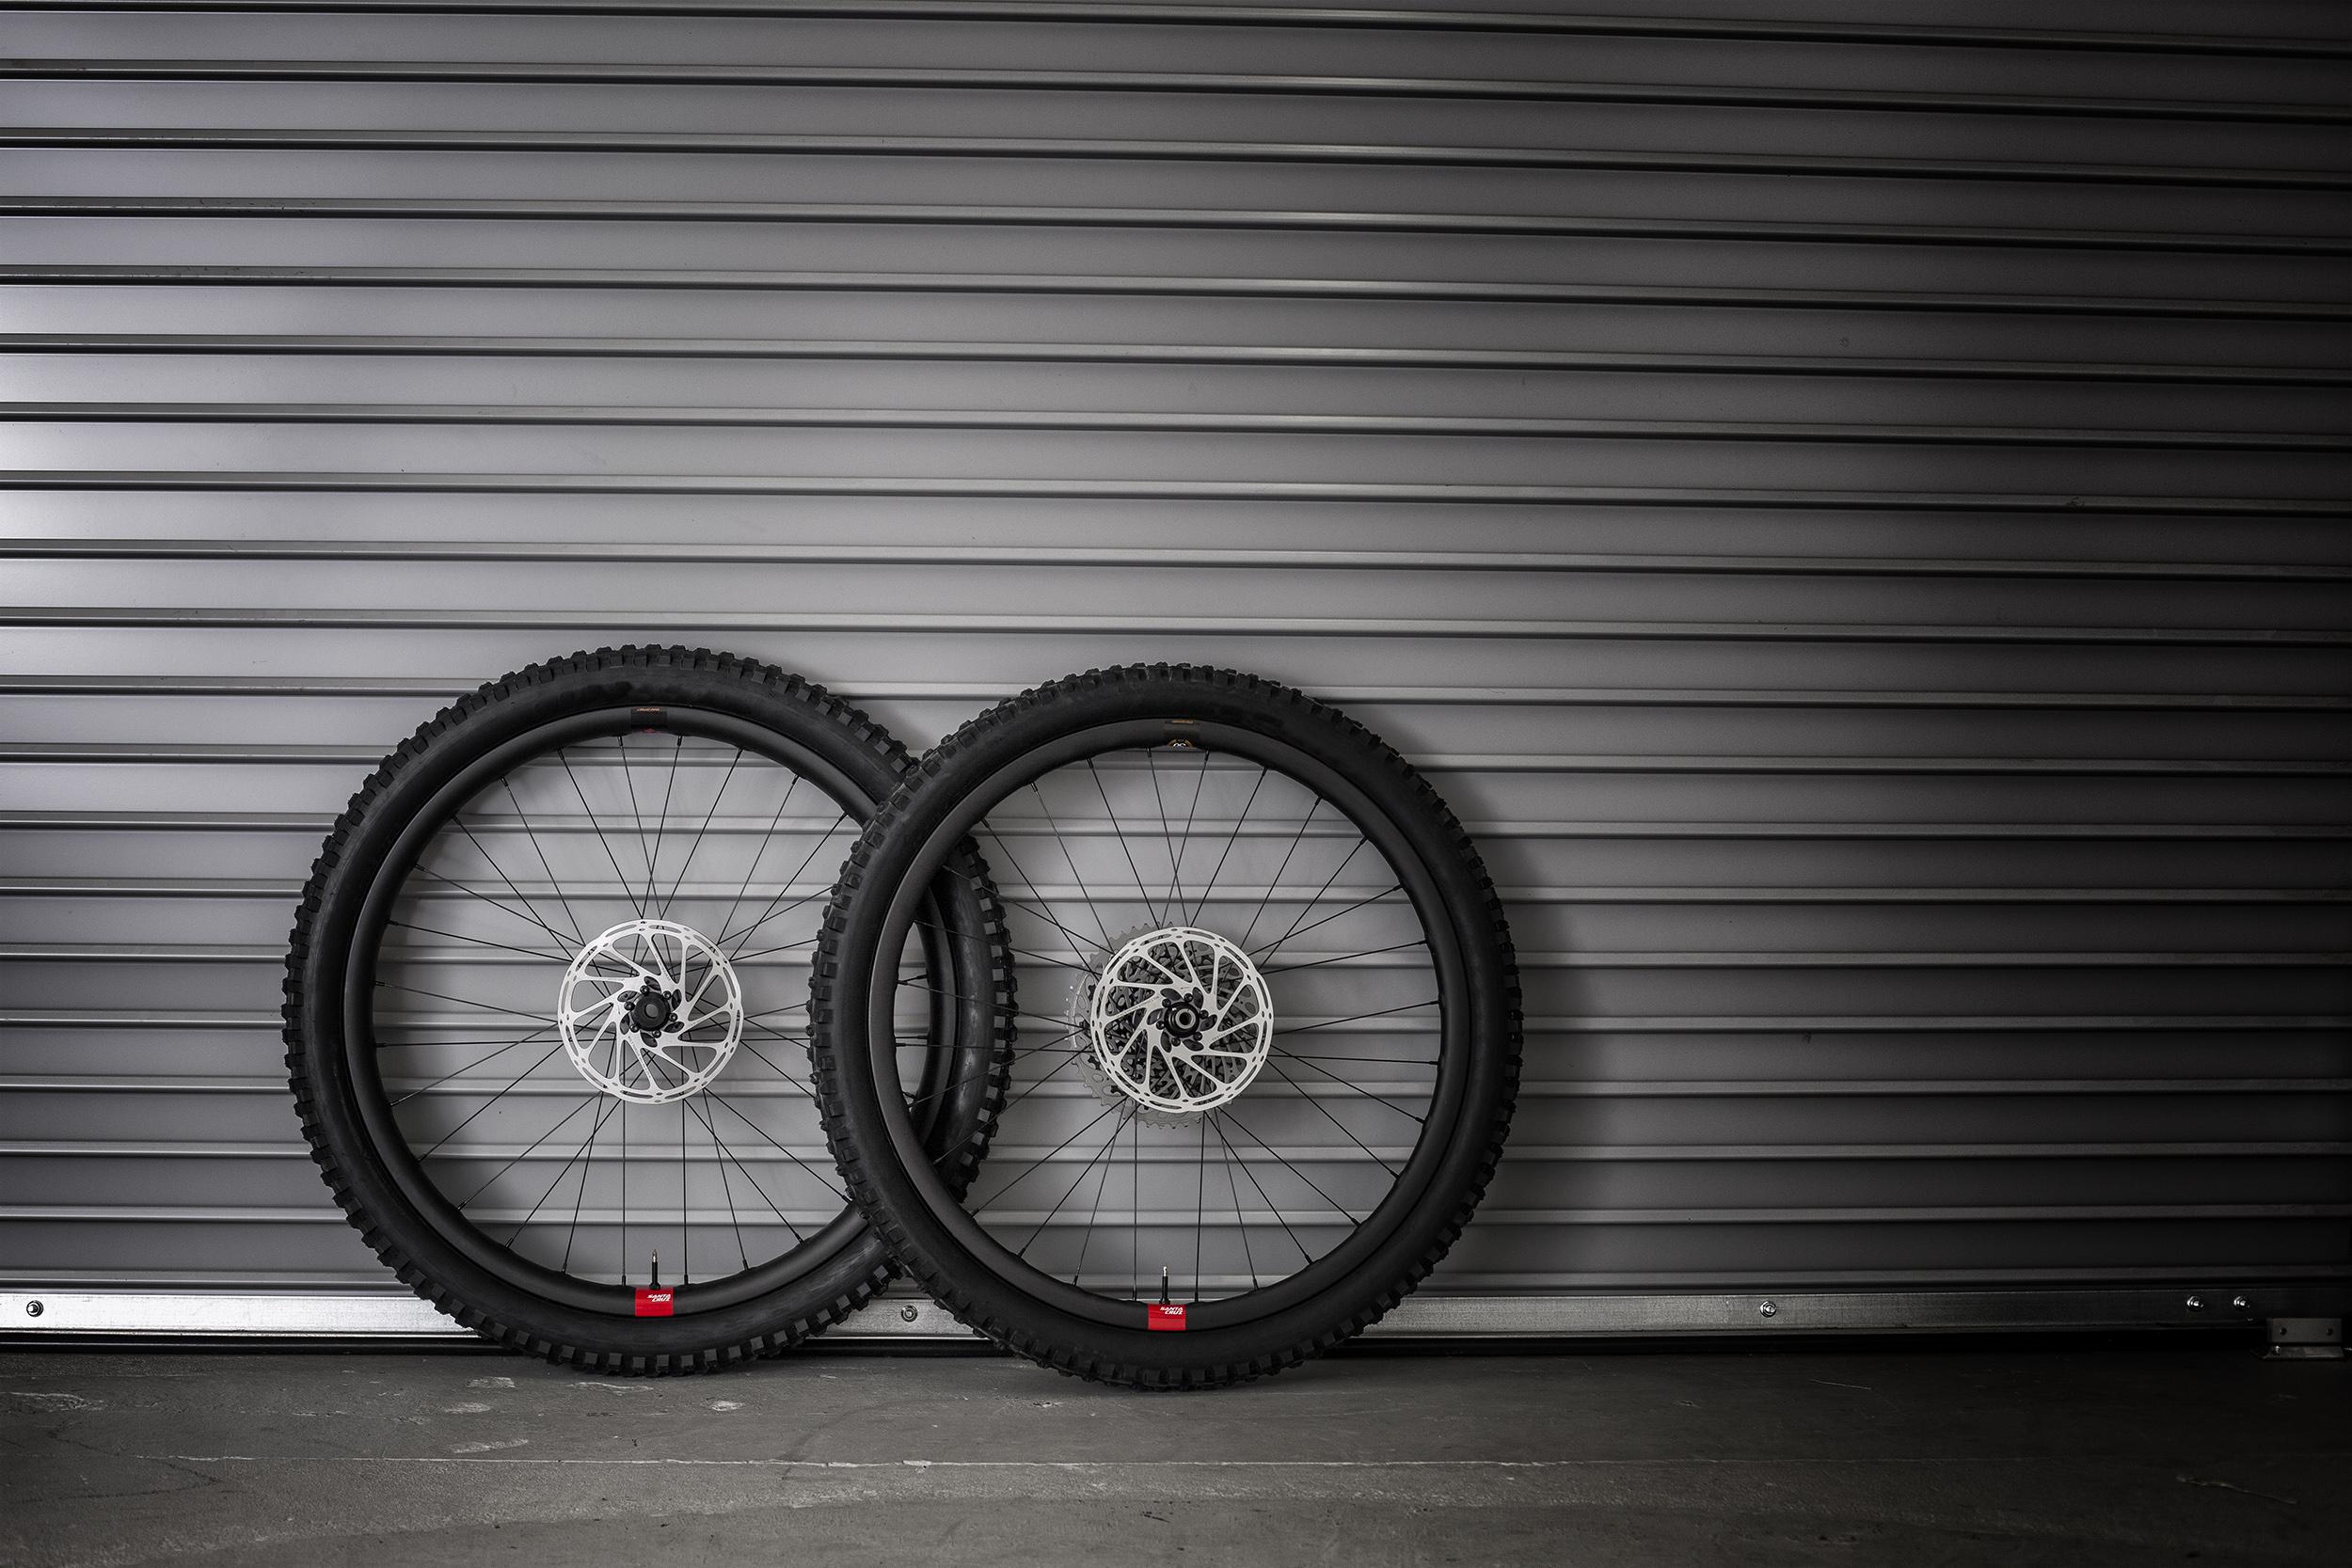 reserve_wheels_grey_rollup.jpg